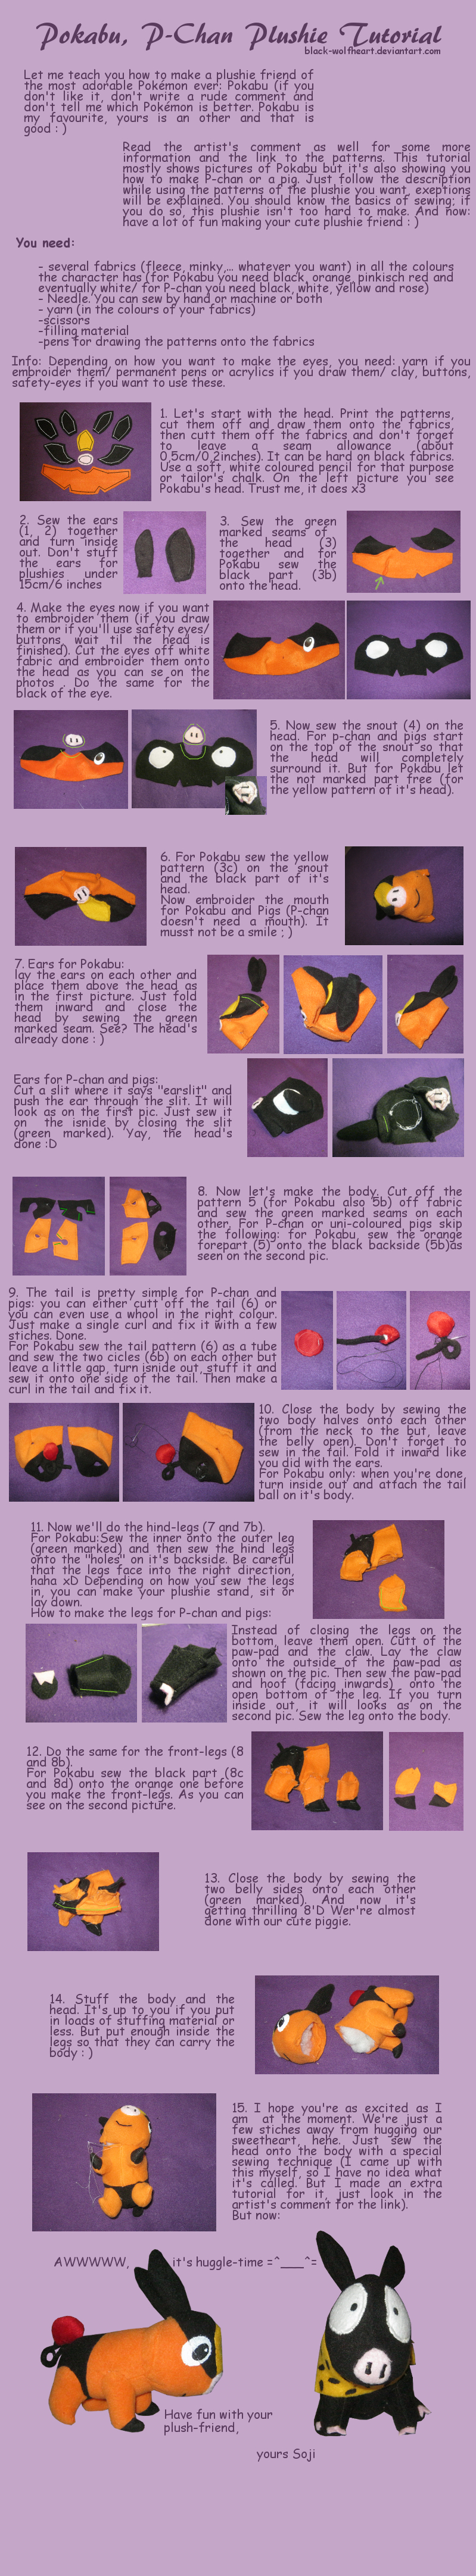 Tepig, p-chan, pig plushie tutorial by Samurai-Akita